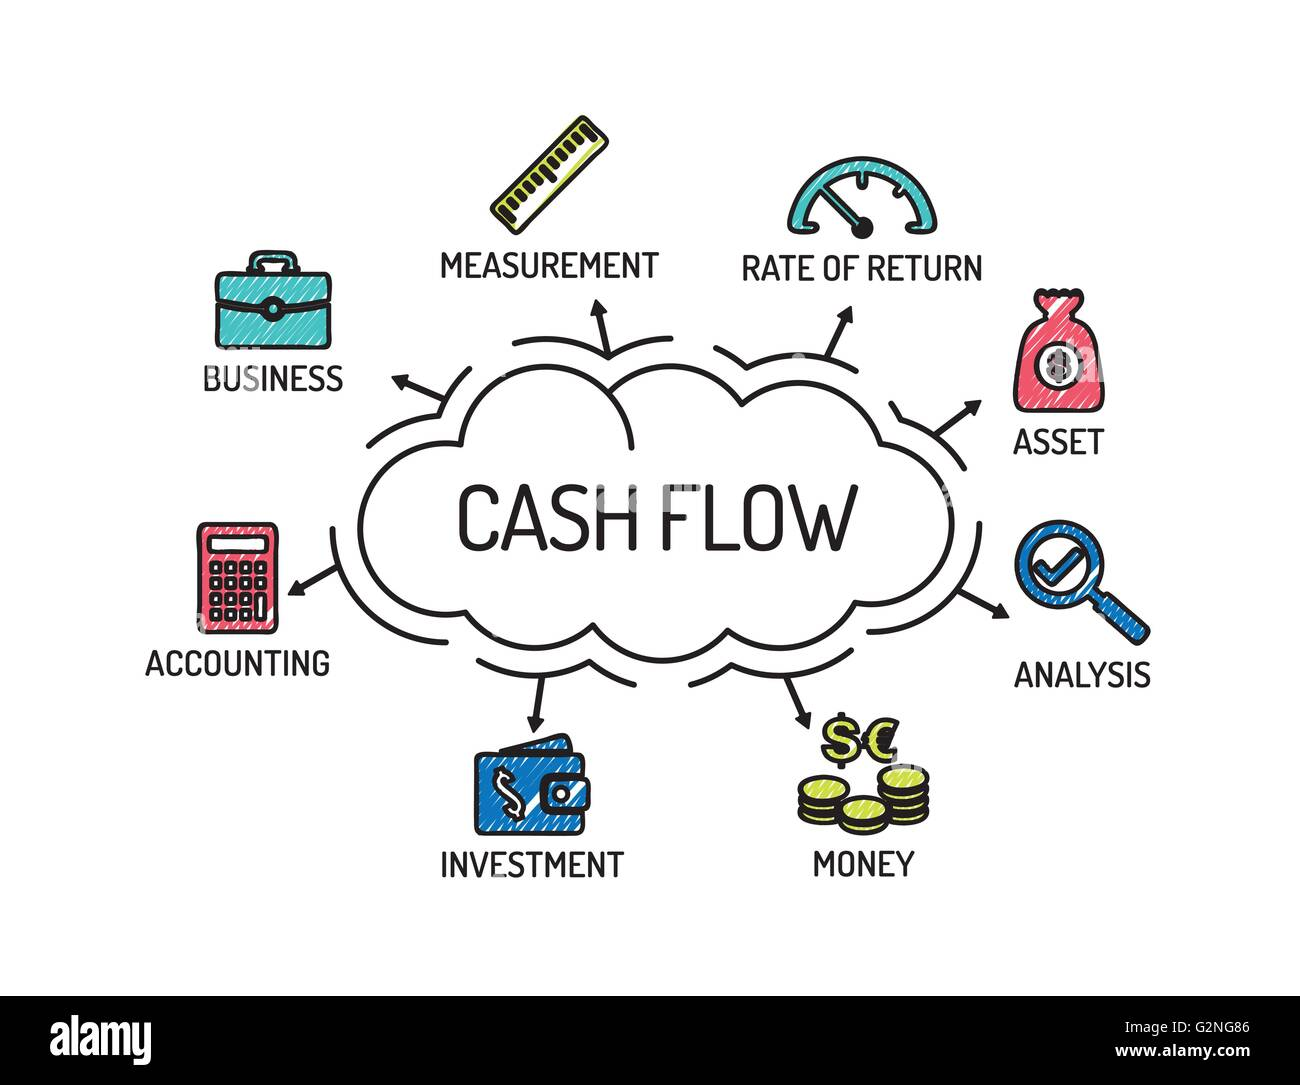 cash flow diagramm mit keywords und symbole skizze vektor abbildung bild 104965286 alamy. Black Bedroom Furniture Sets. Home Design Ideas